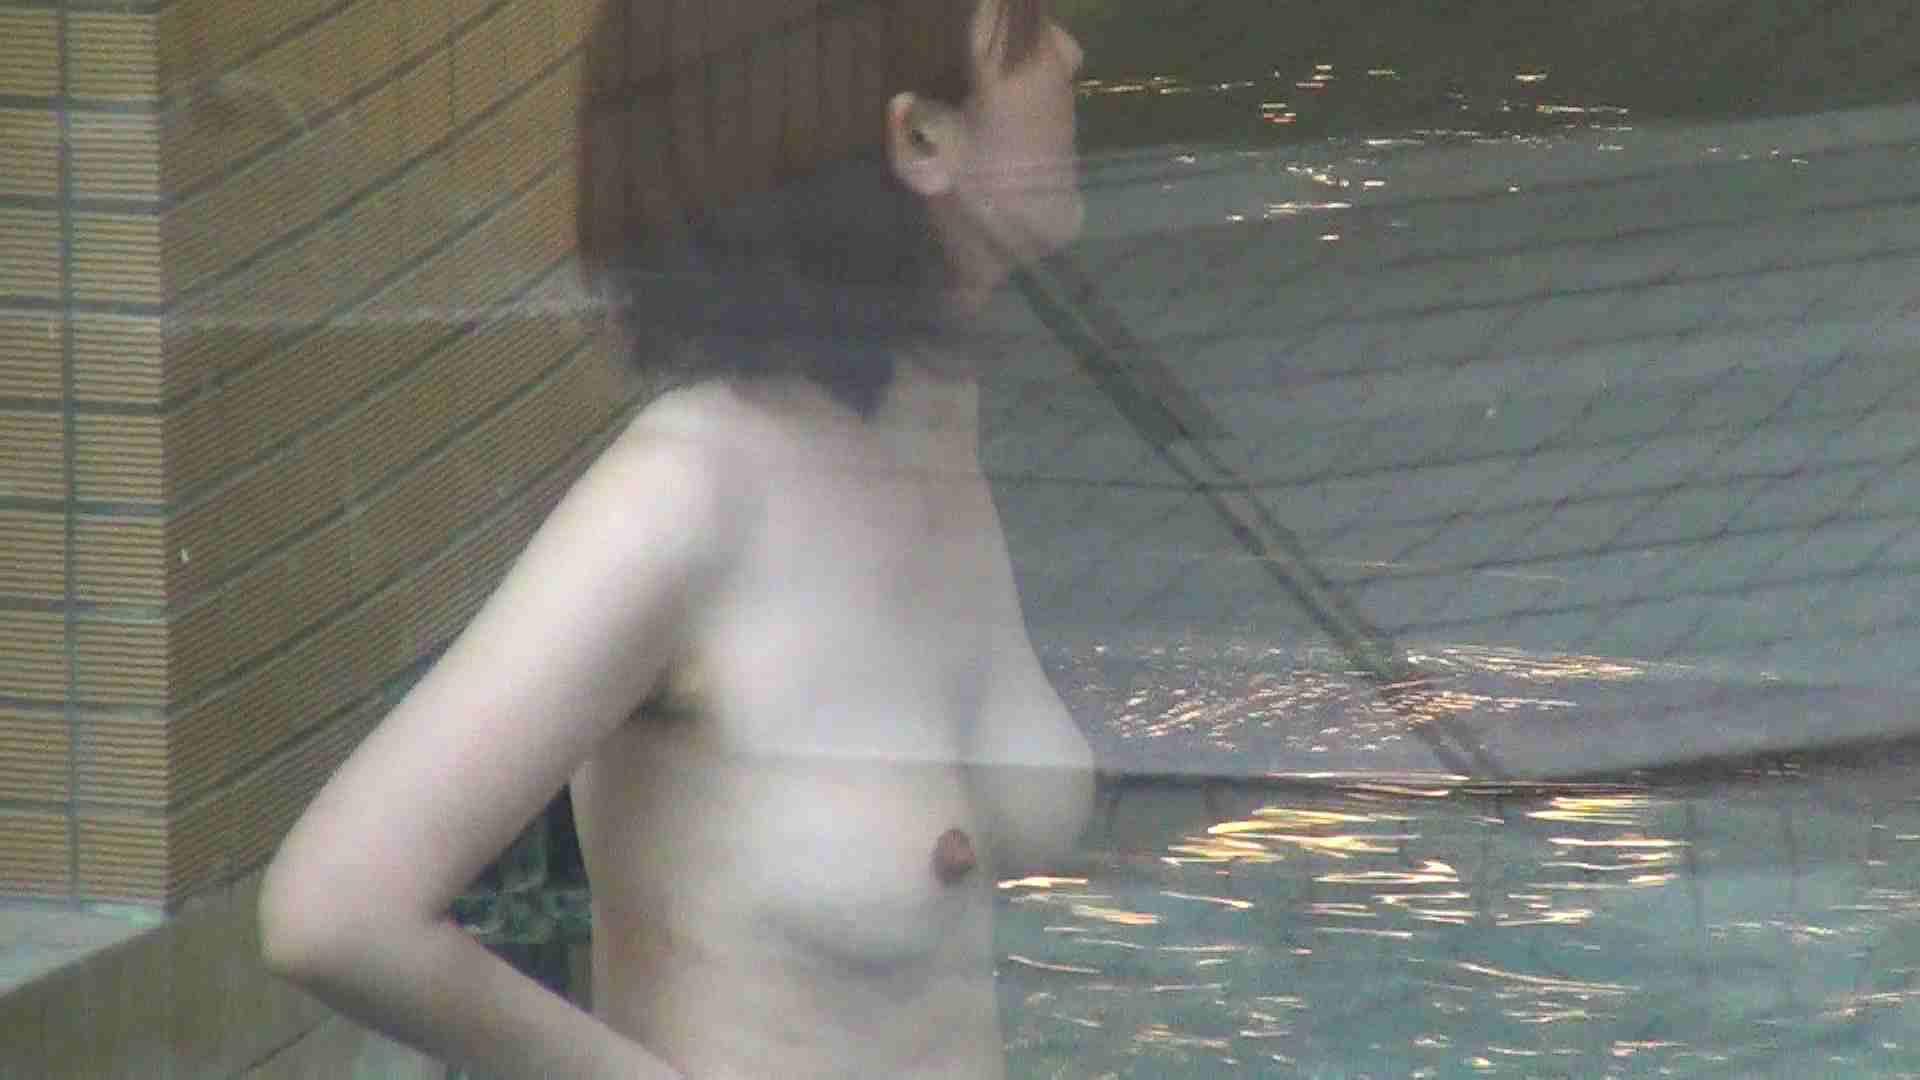 Aquaな露天風呂Vol.297 OLセックス 隠し撮りオマンコ動画紹介 103画像 68